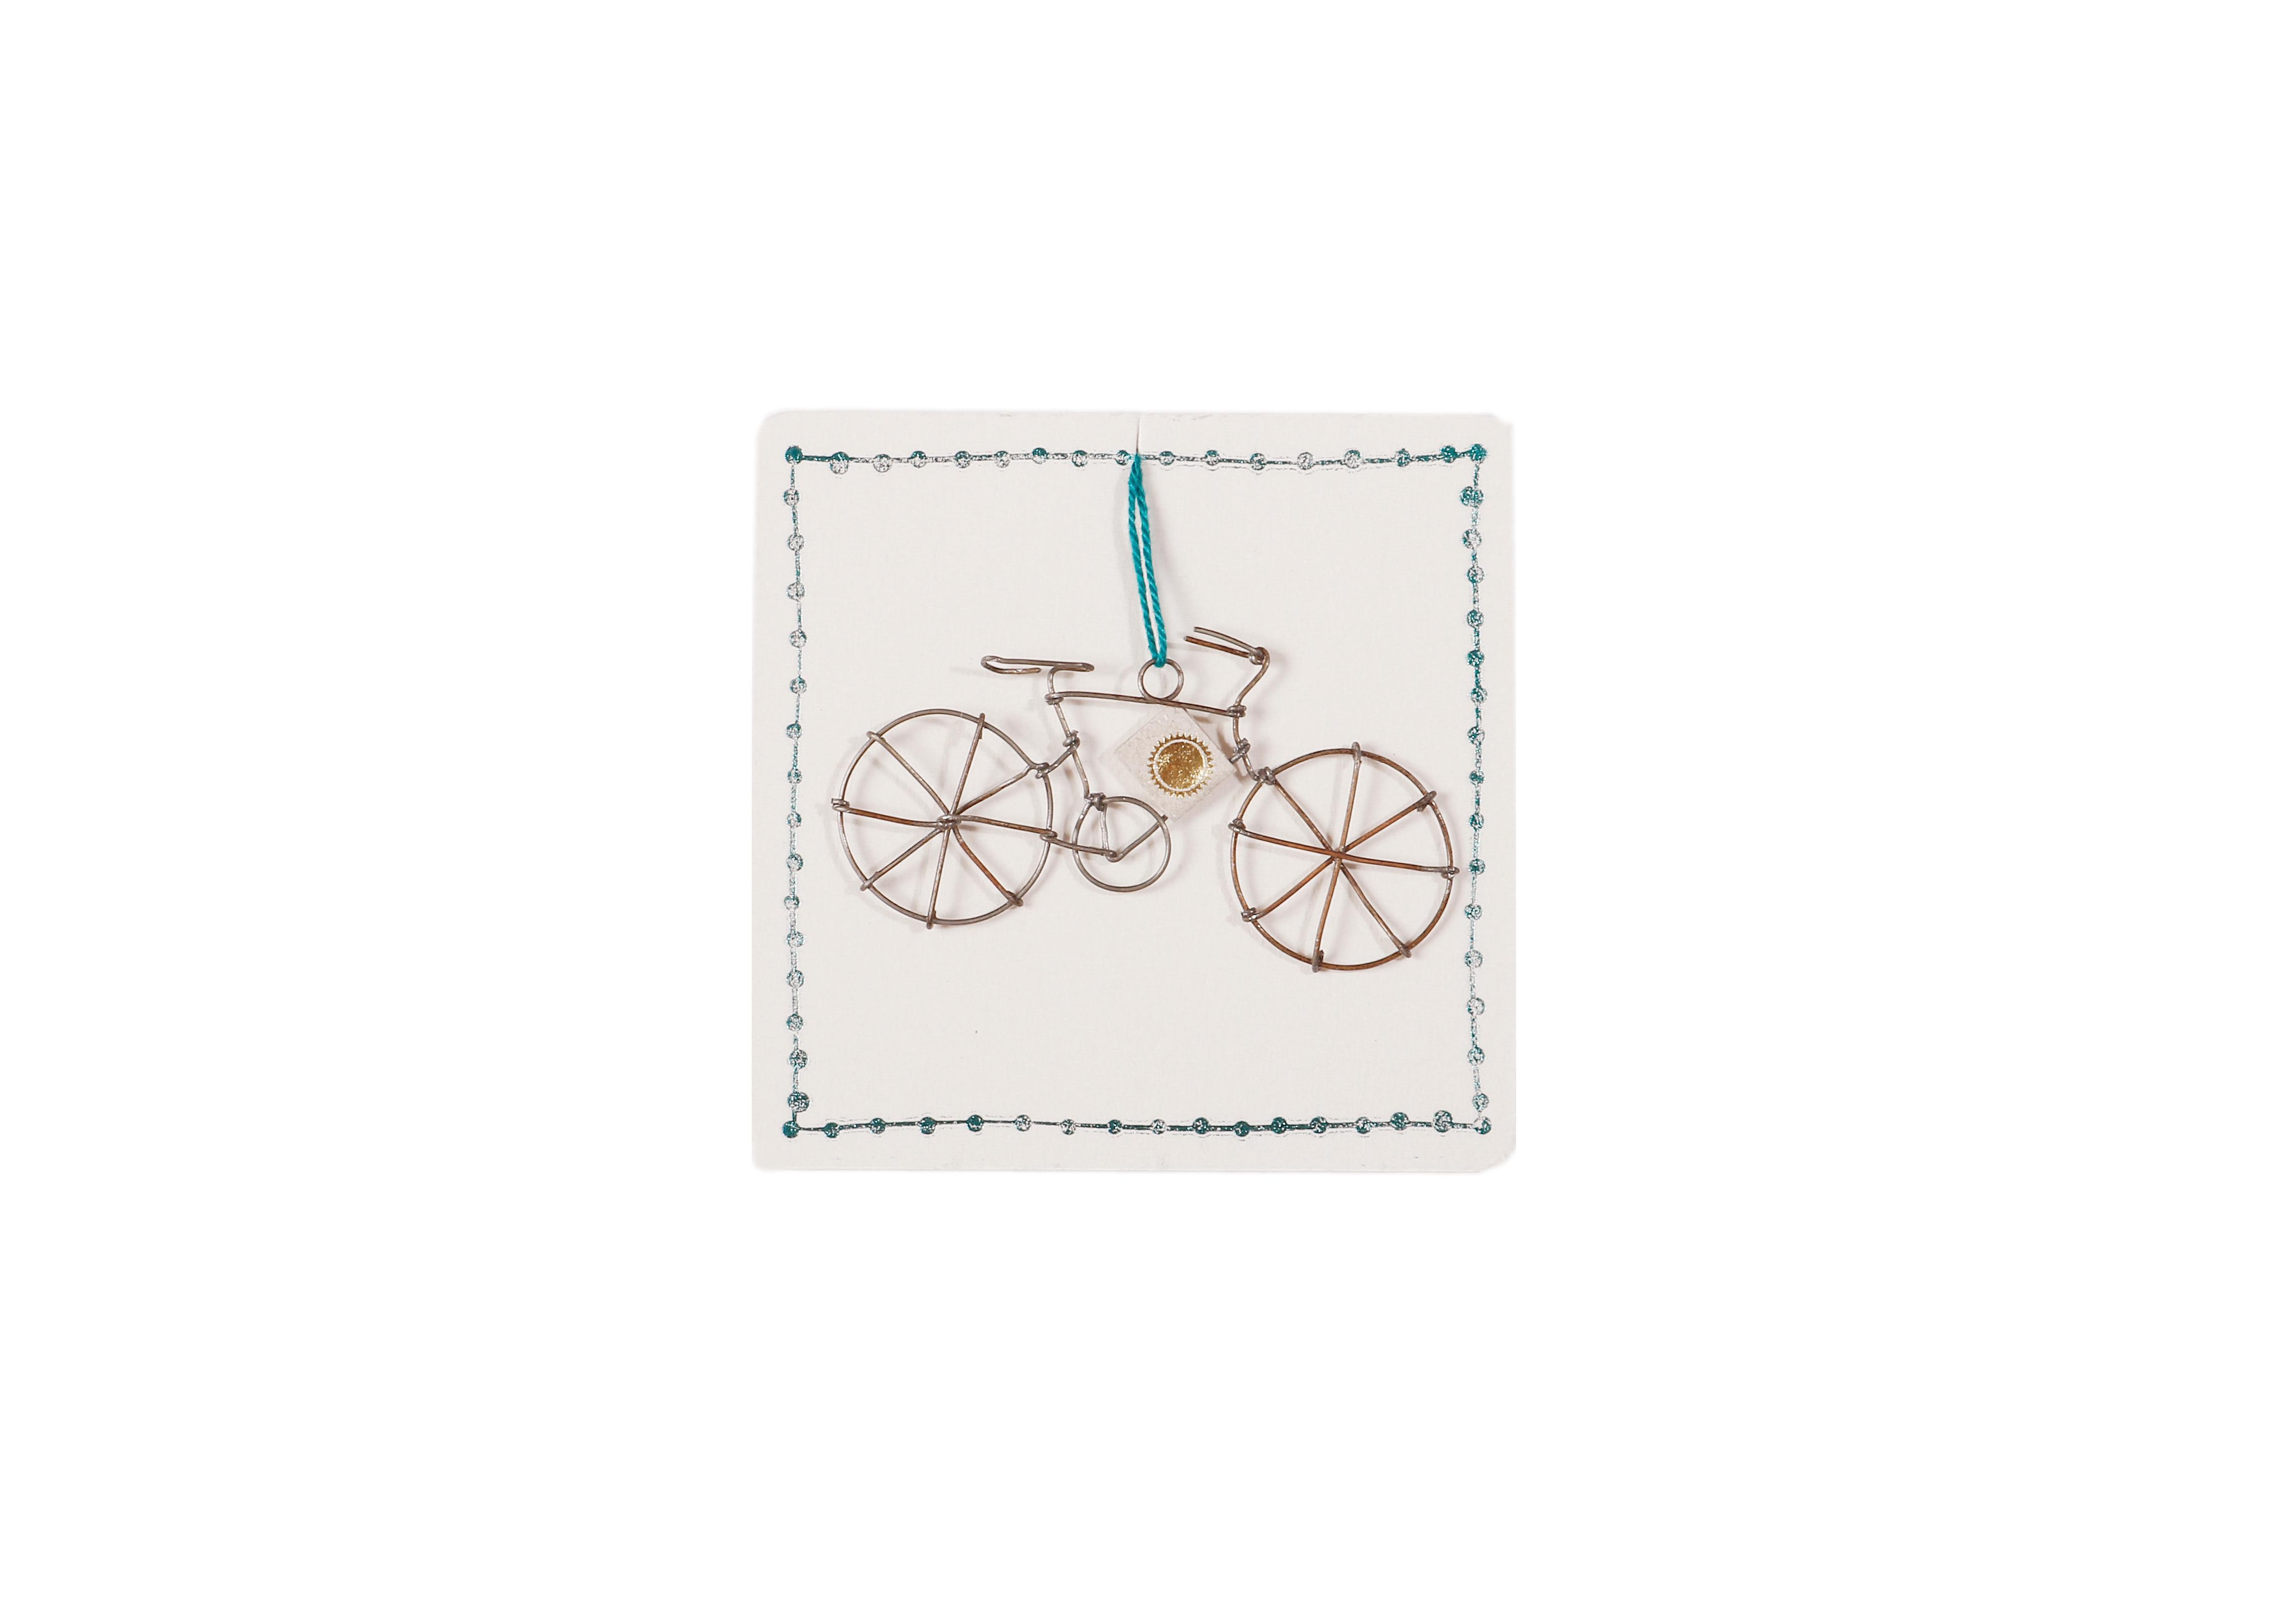 Drahtgrüße - Fahrrad - Good old friends